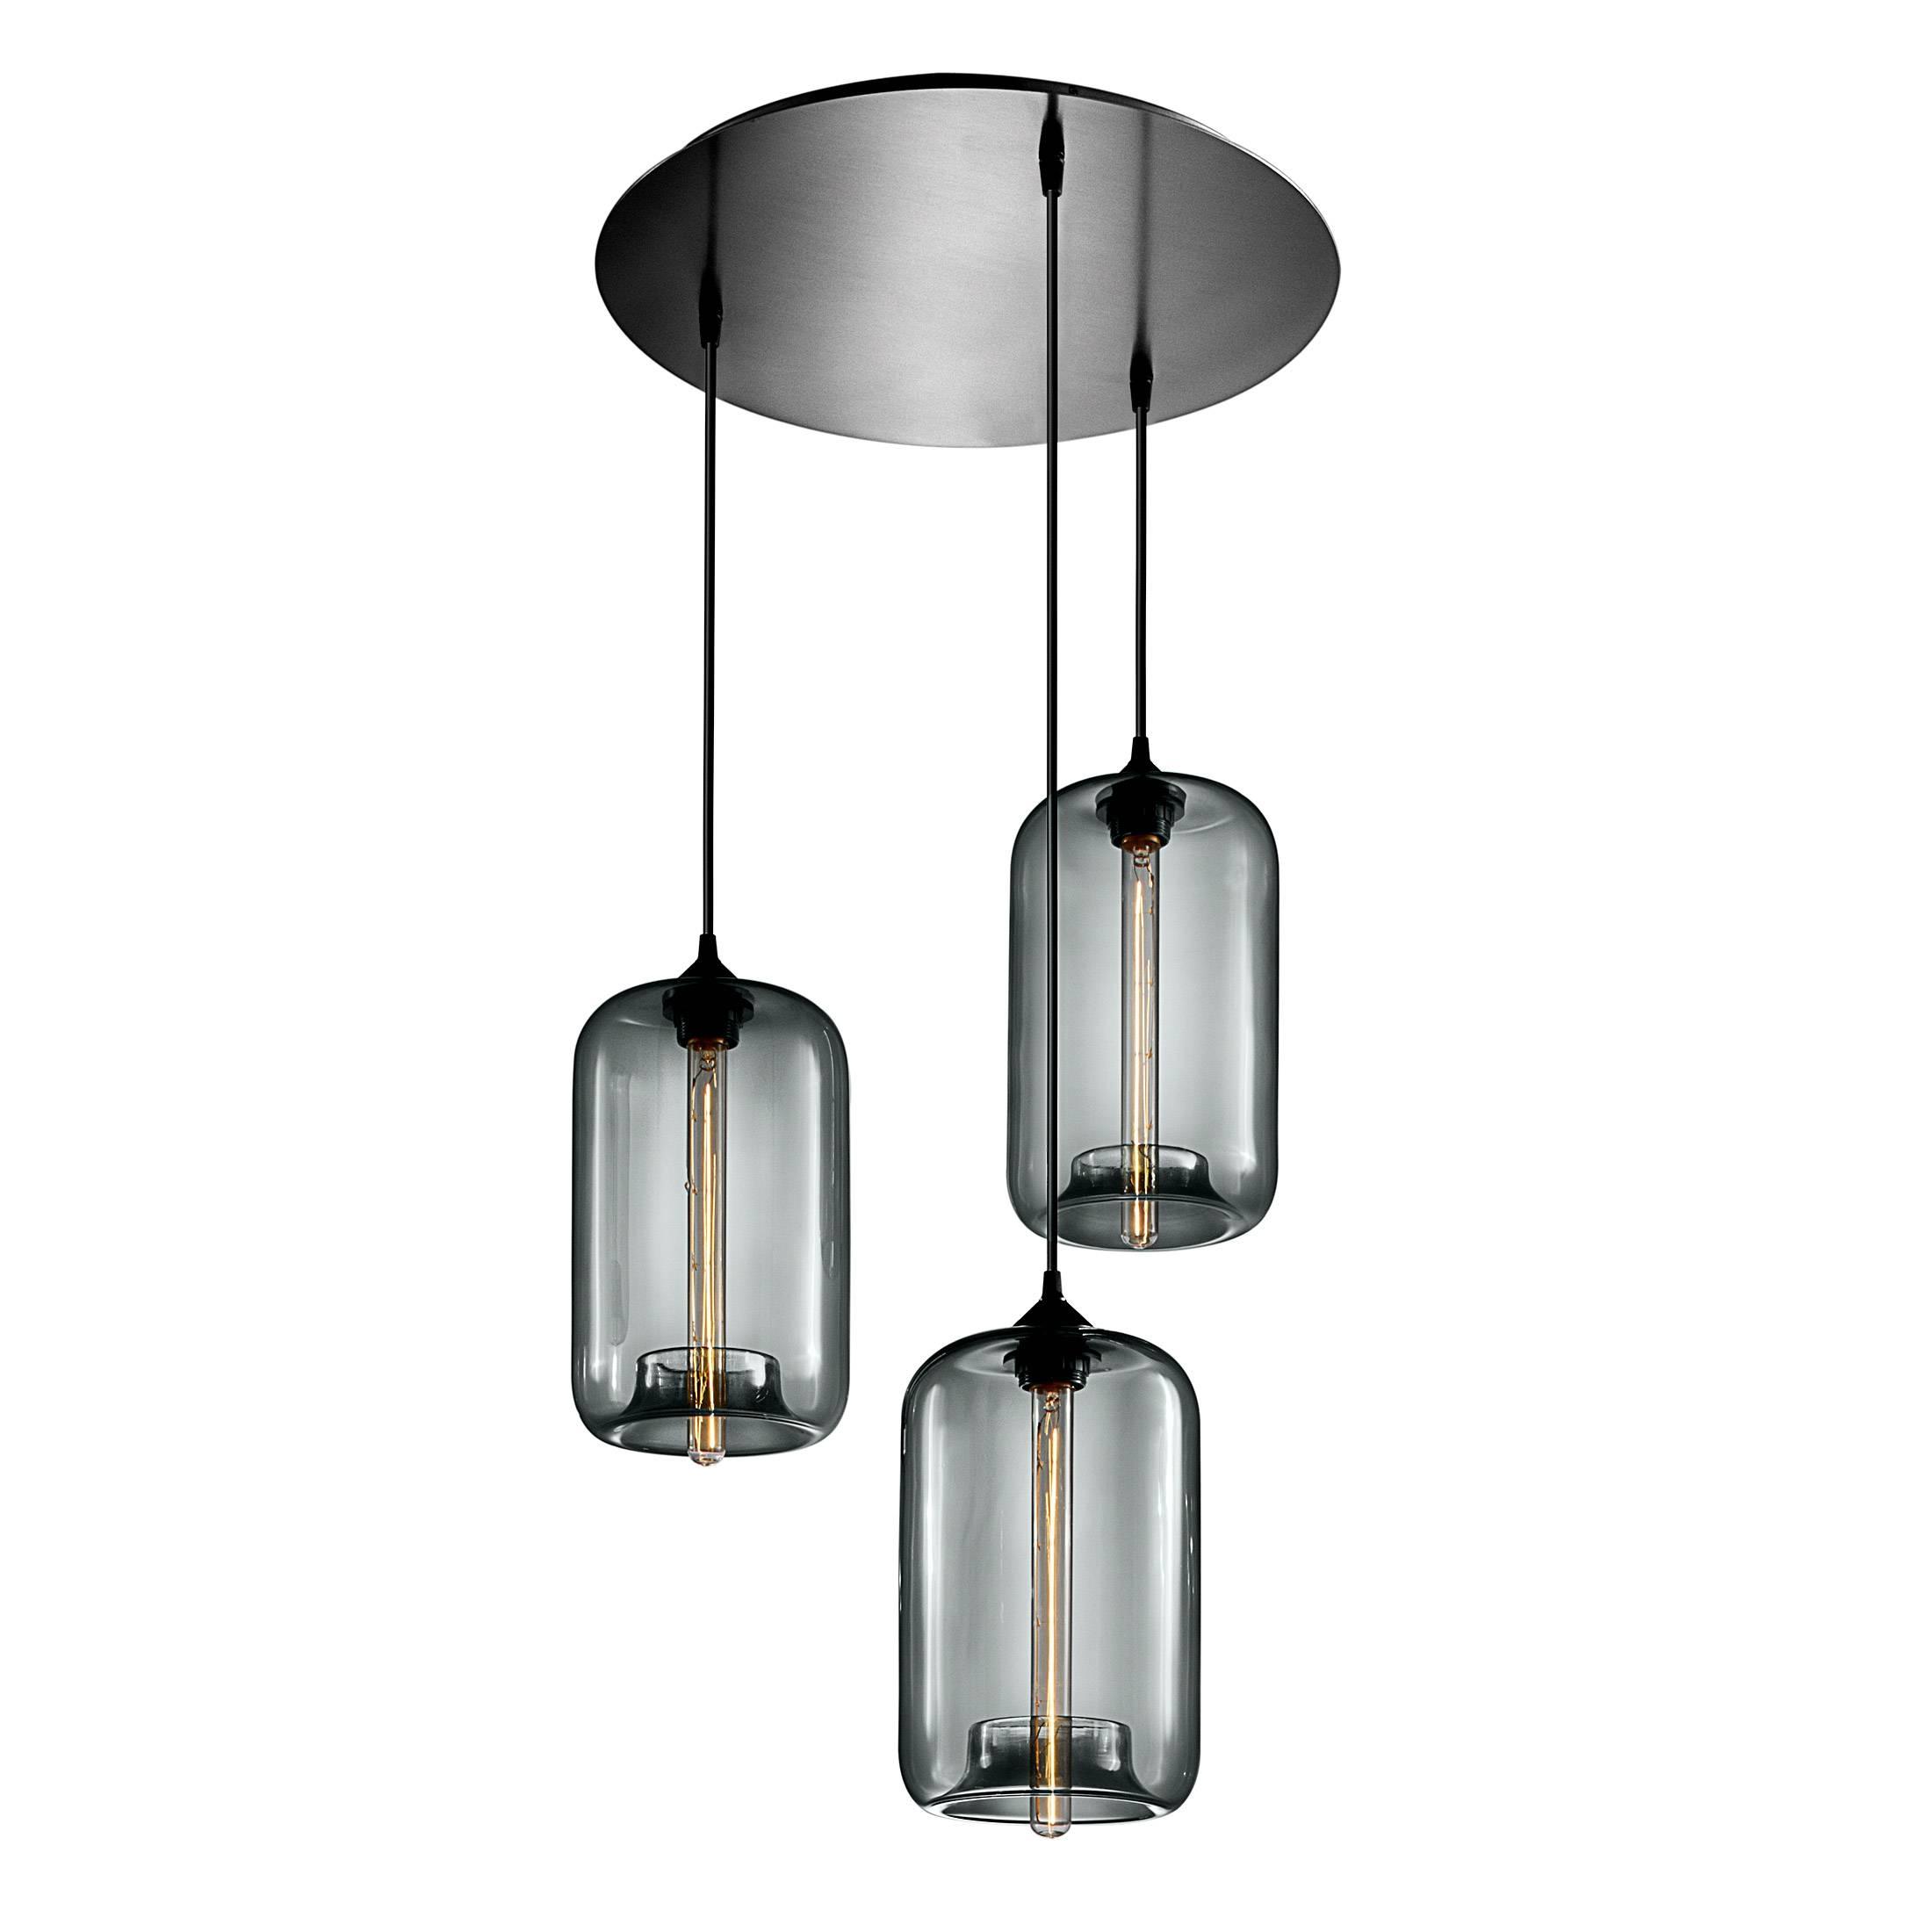 Light: Acquatinta Pendant Light throughout Acquatinta Pendant Lights (Image 10 of 15)